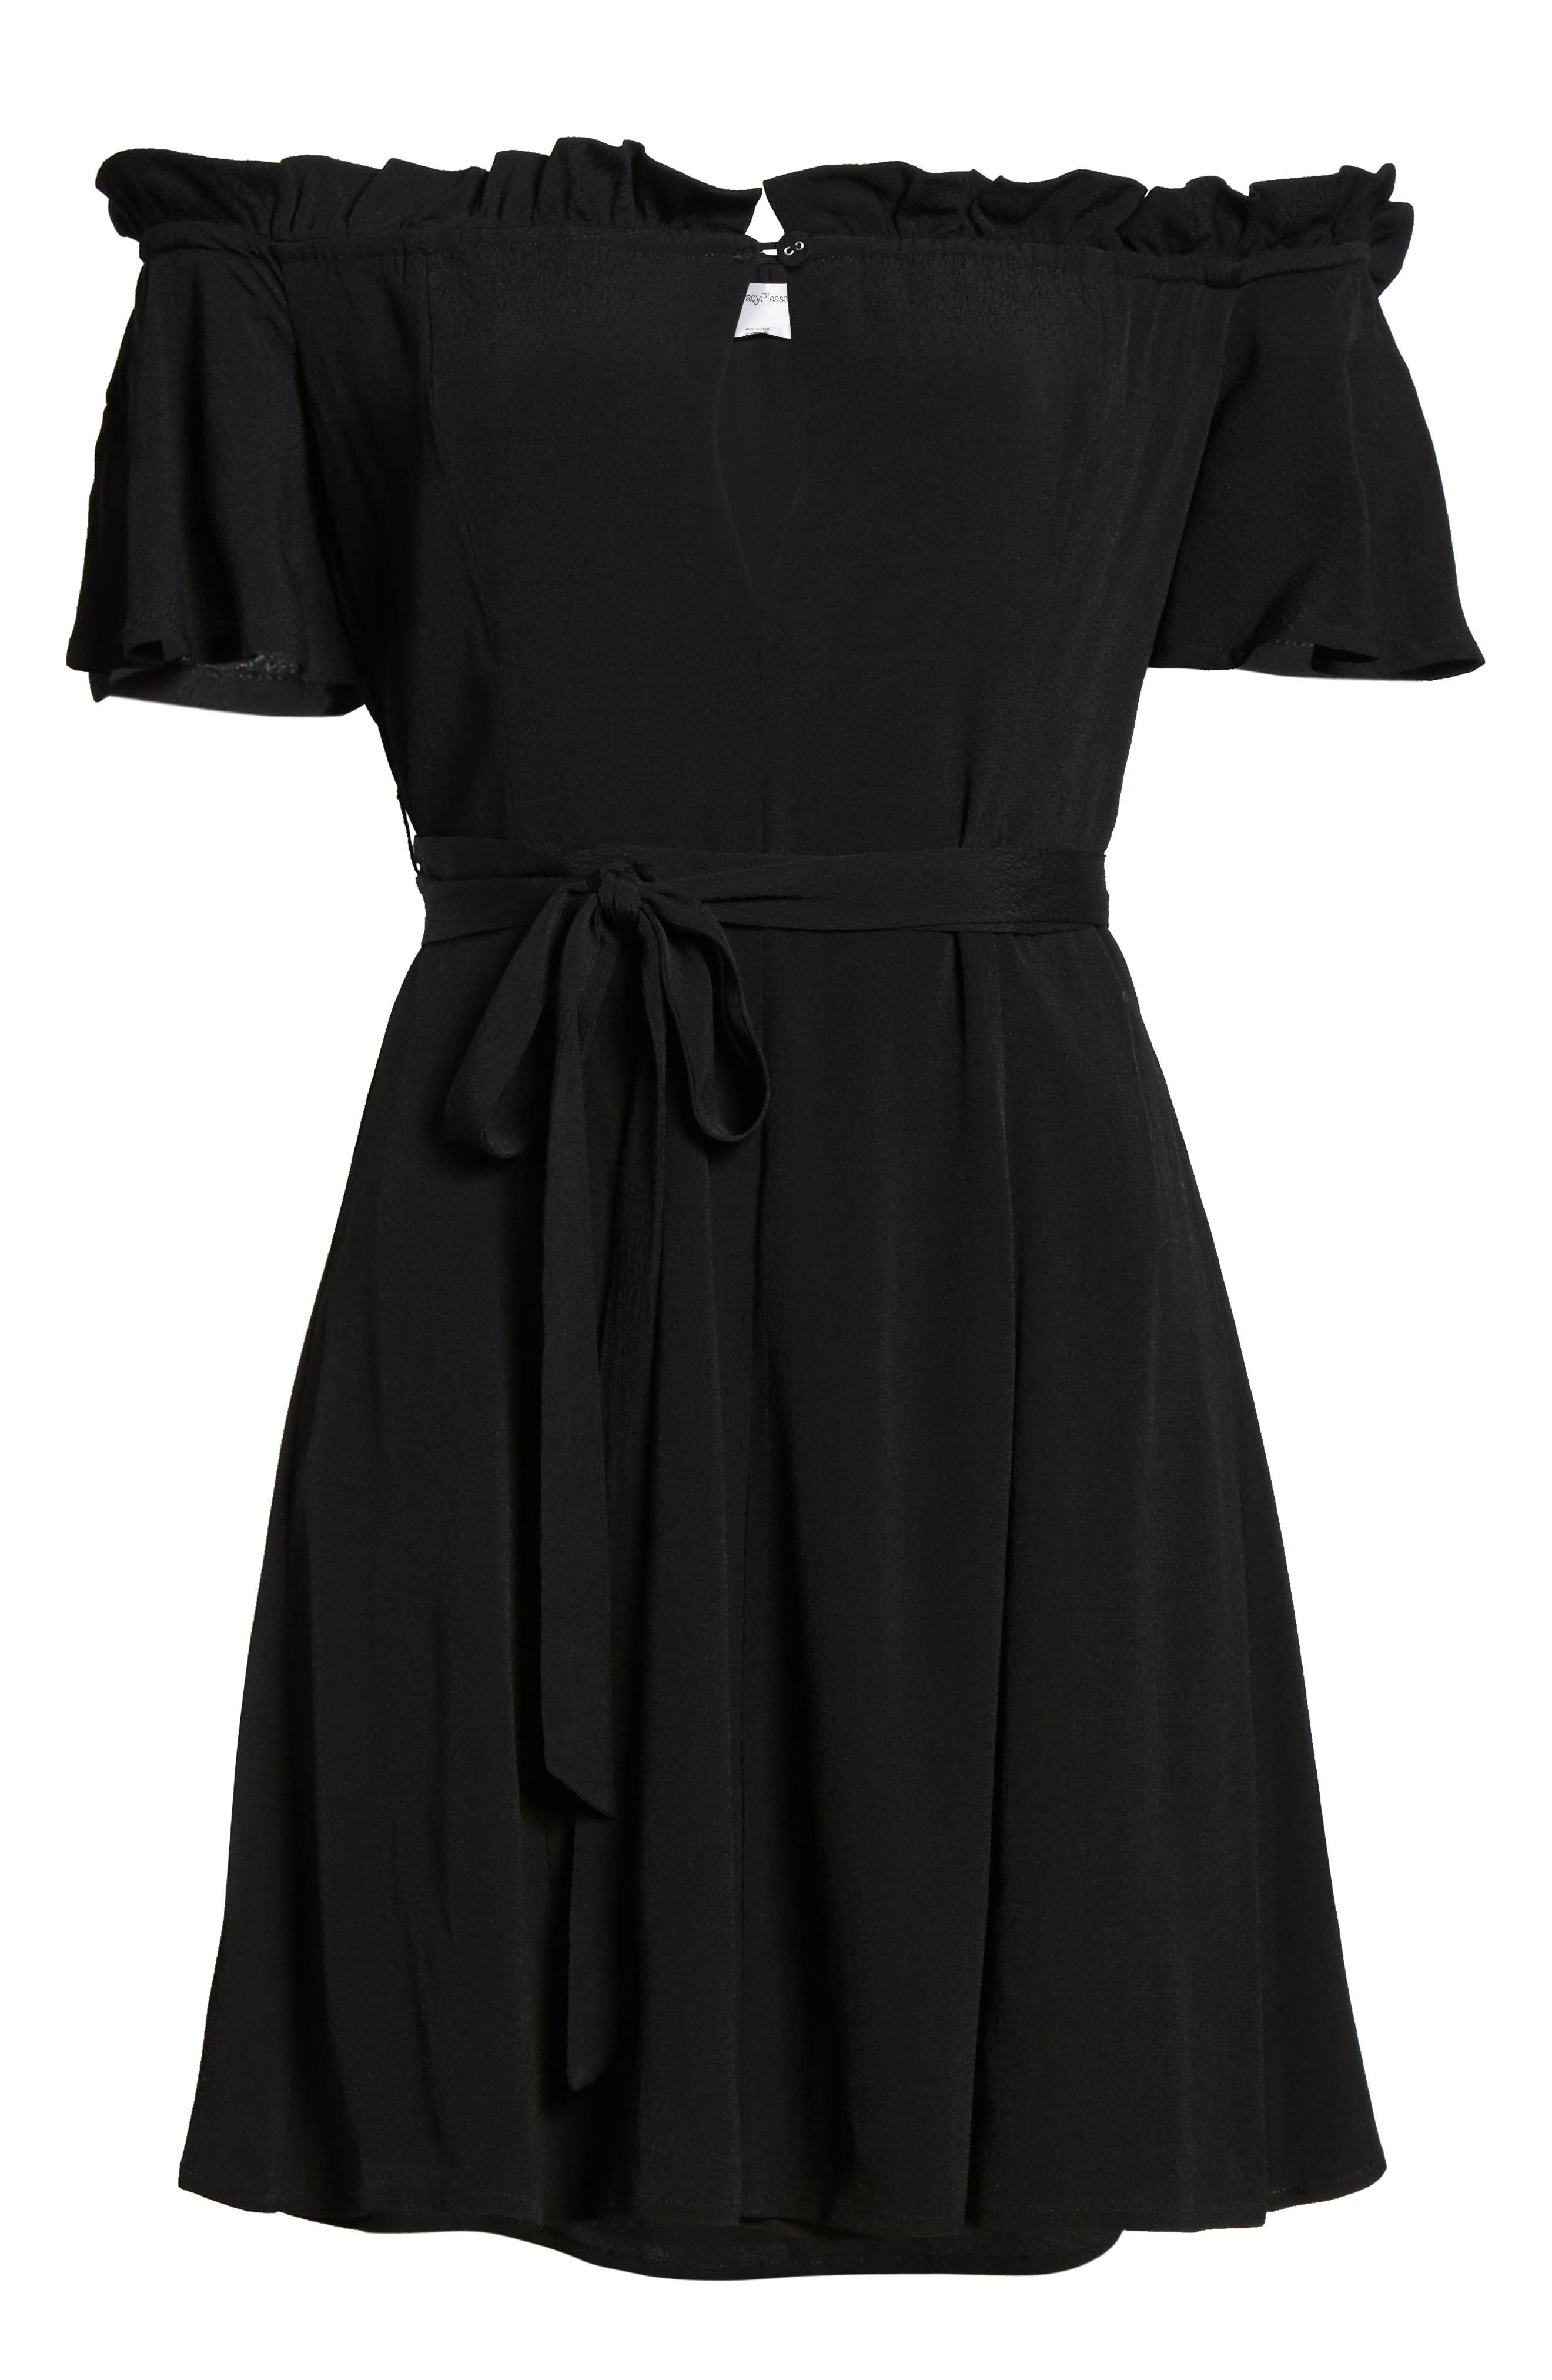 Deluth Off the Shoulder Dress,                             Alternate thumbnail 11, color,